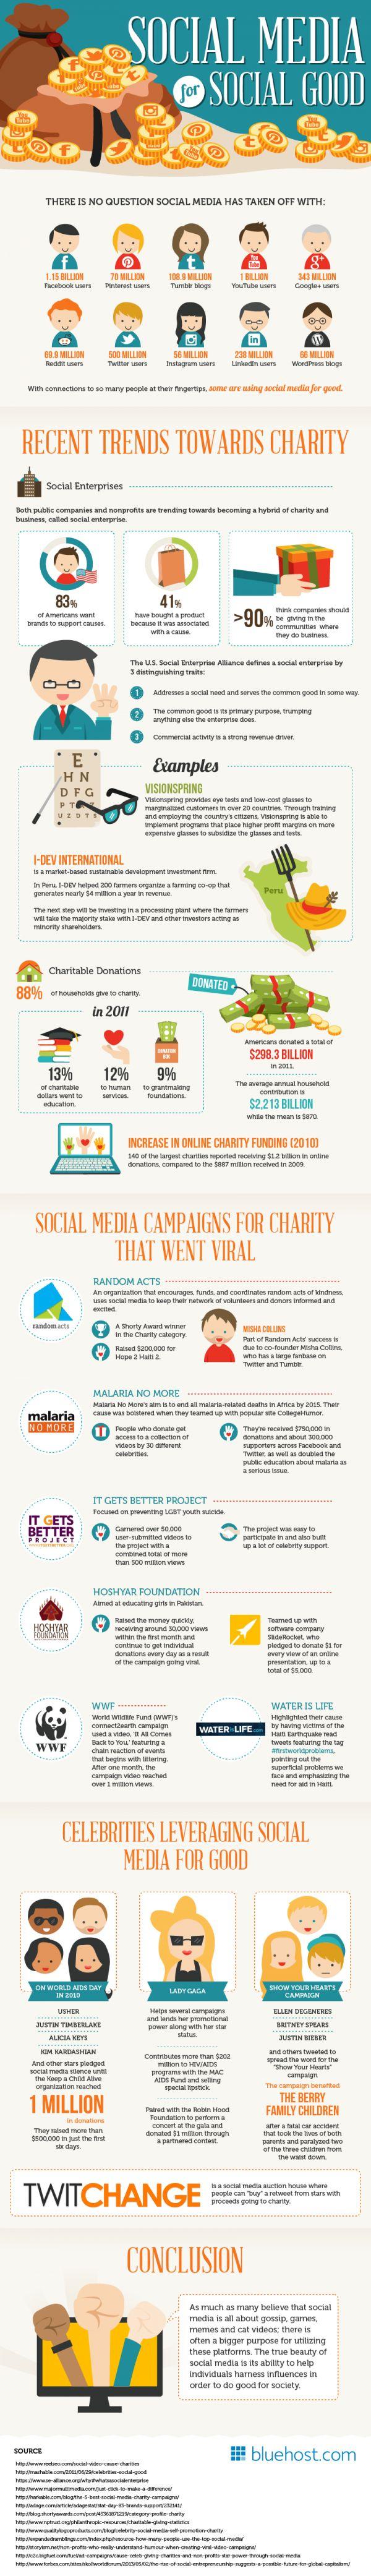 Social Media And Social Good